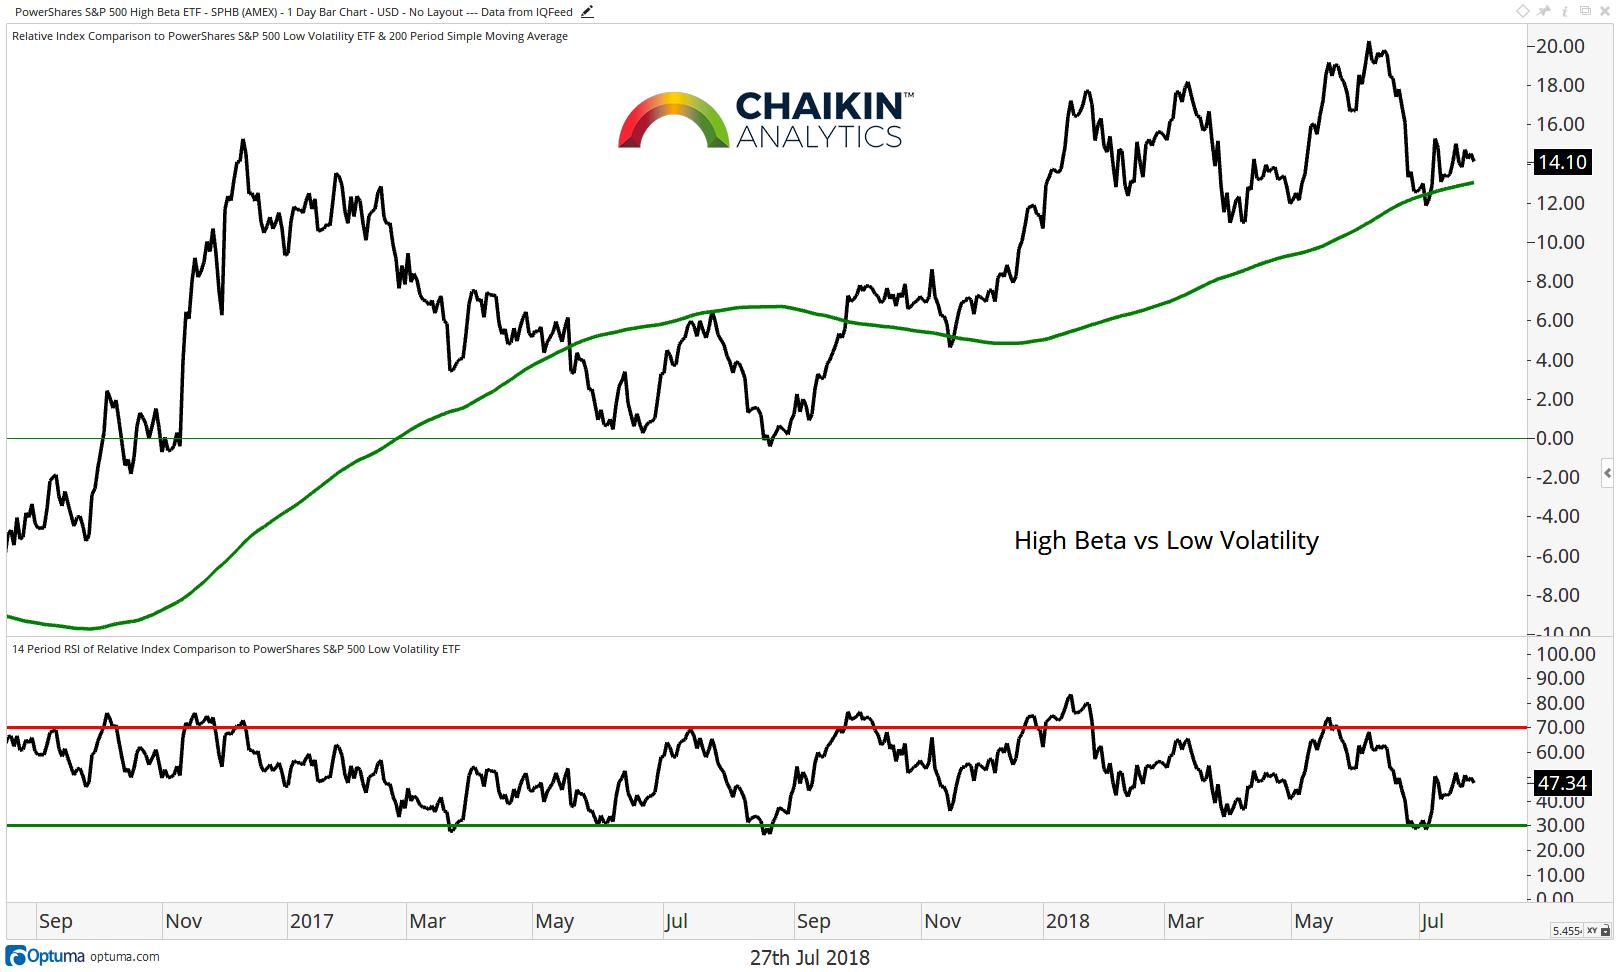 high beta stocks vs low volatility etf chart july 2018